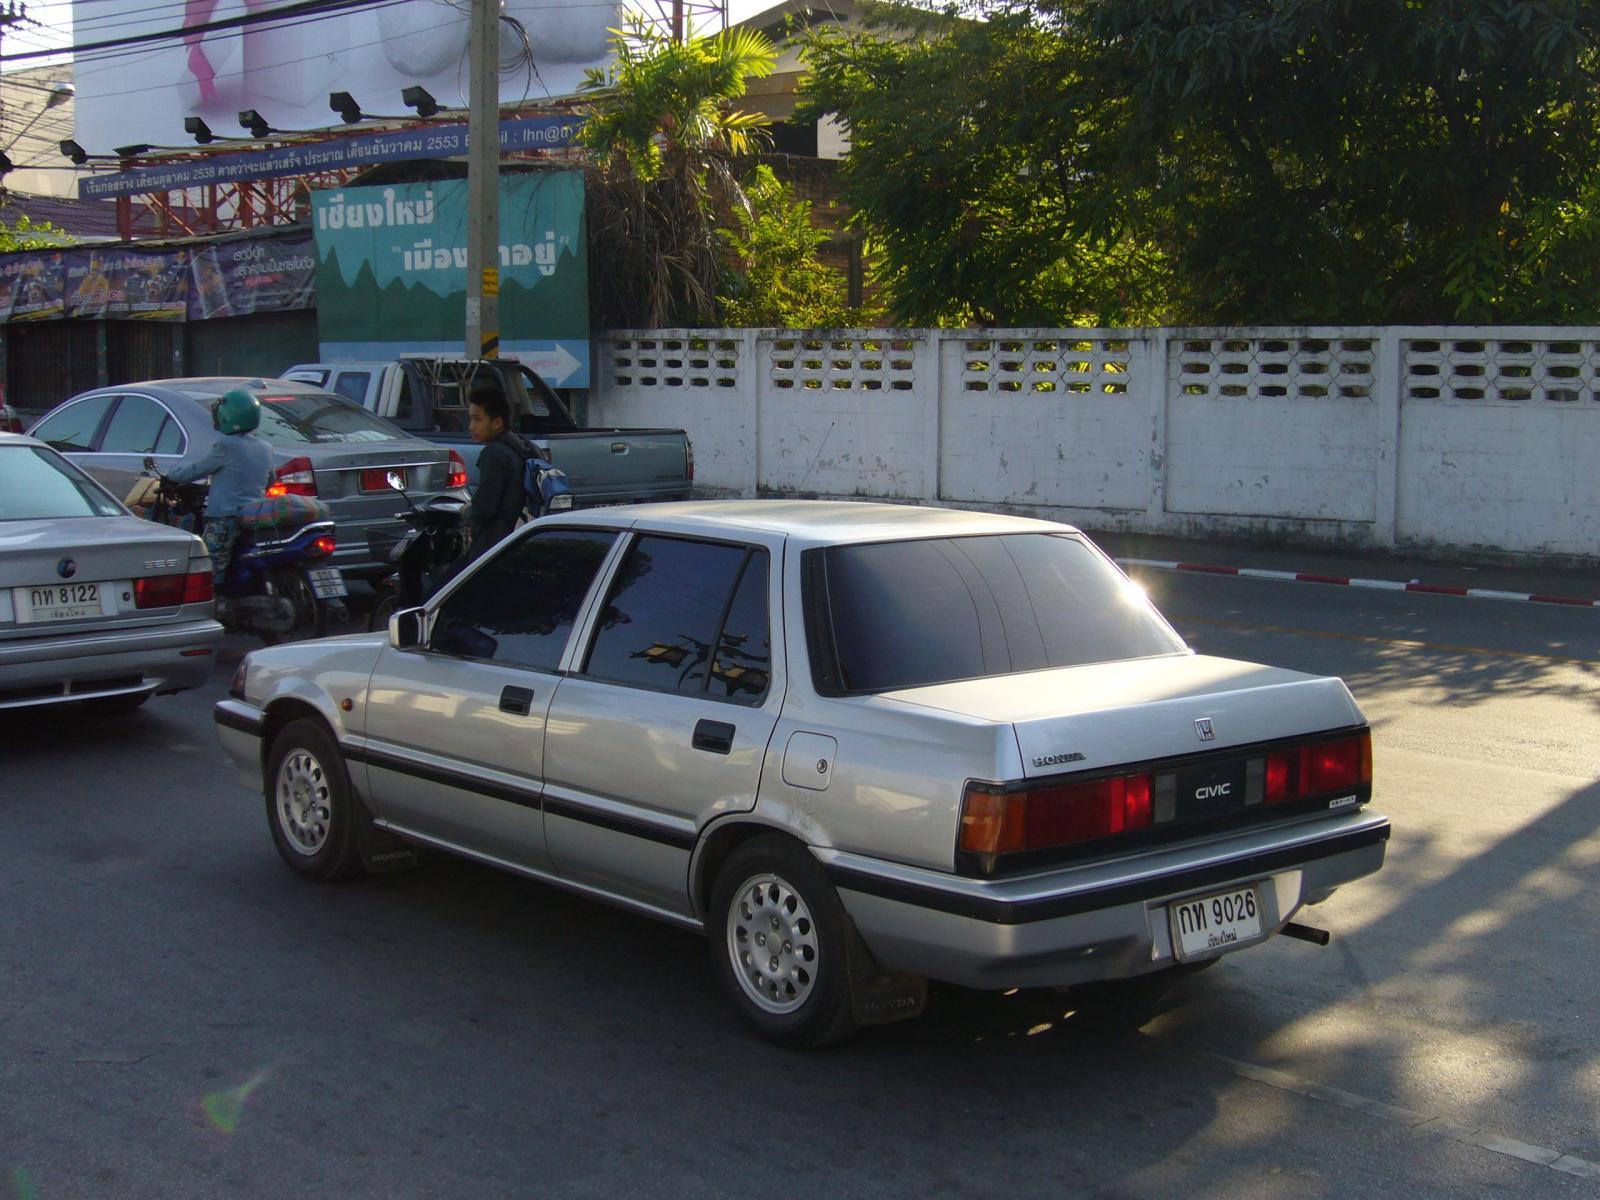 P1220125.JPG